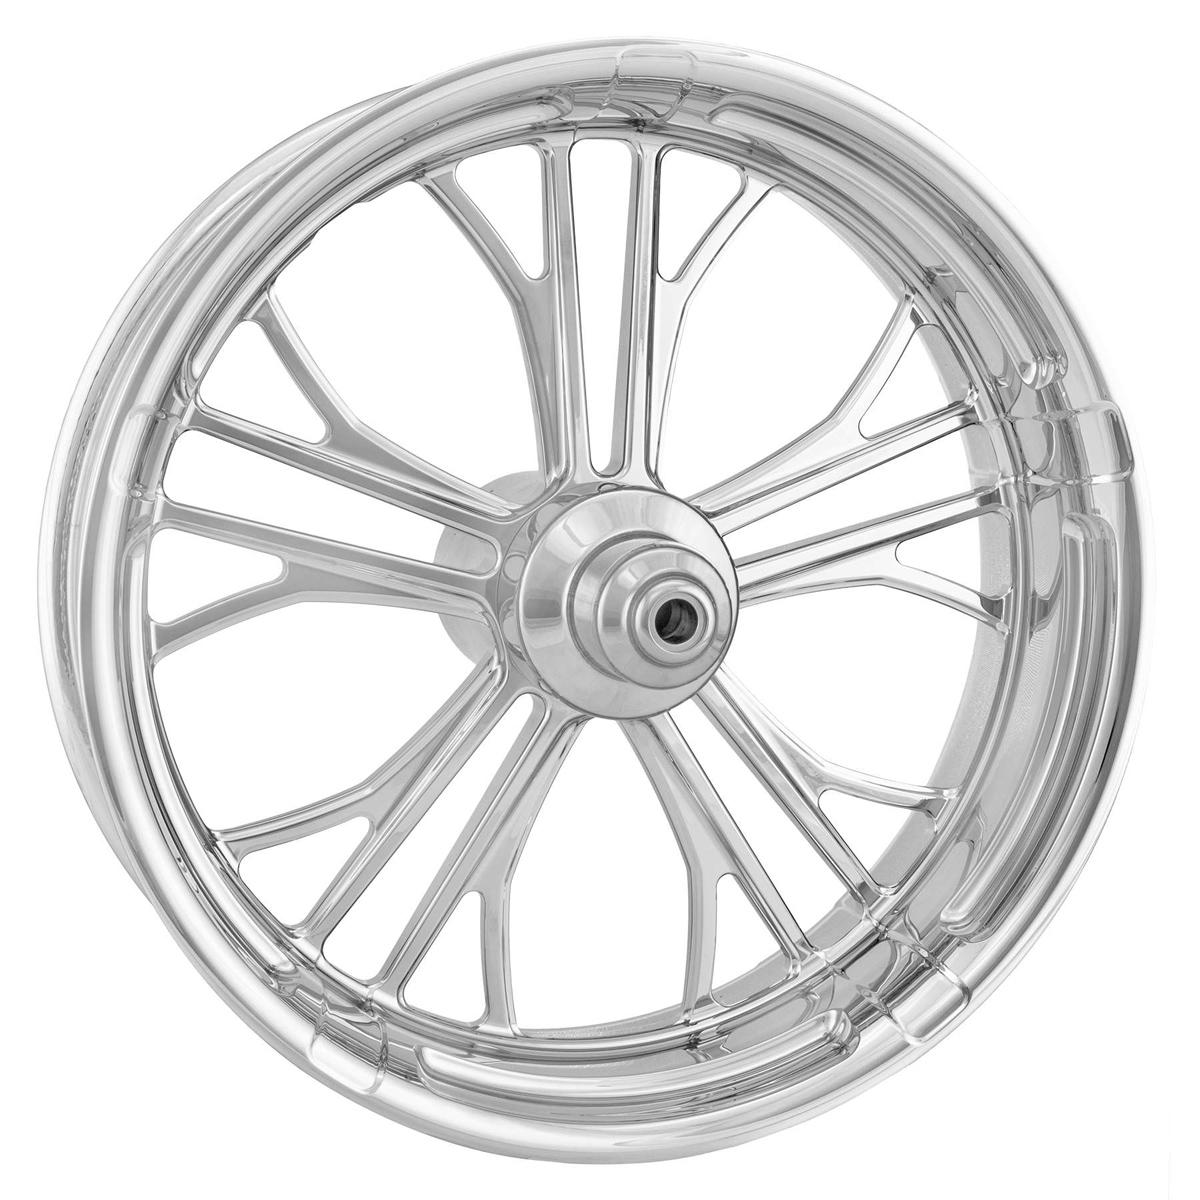 Performance Machine Dixon Chrome Front Wheel 21x3.5 ABS